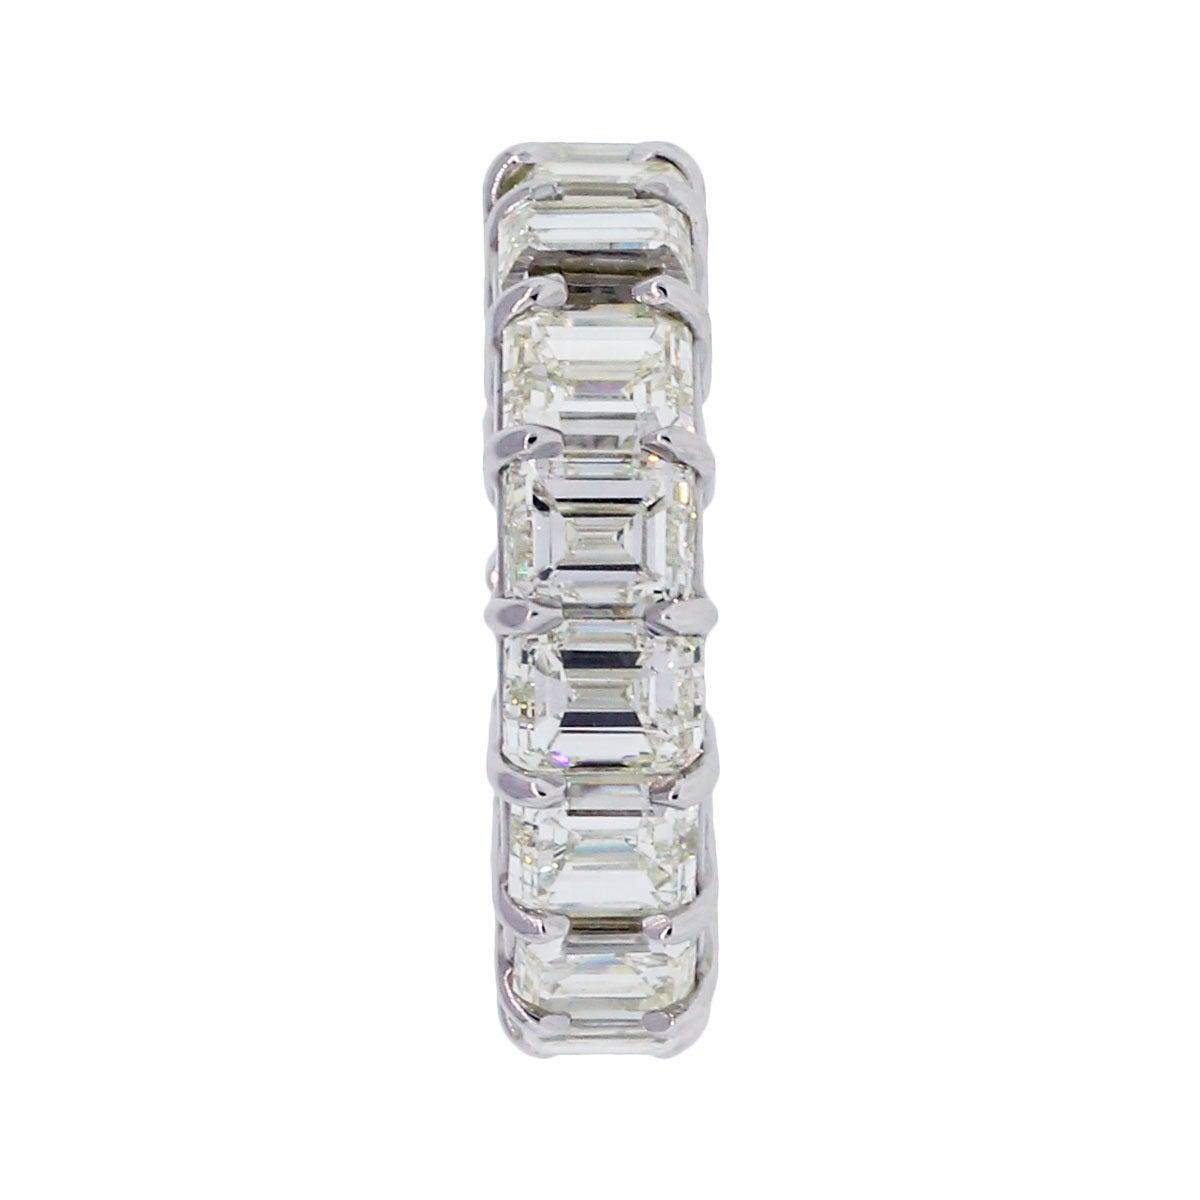 emerald cut 15 carats platinum eternity band ring